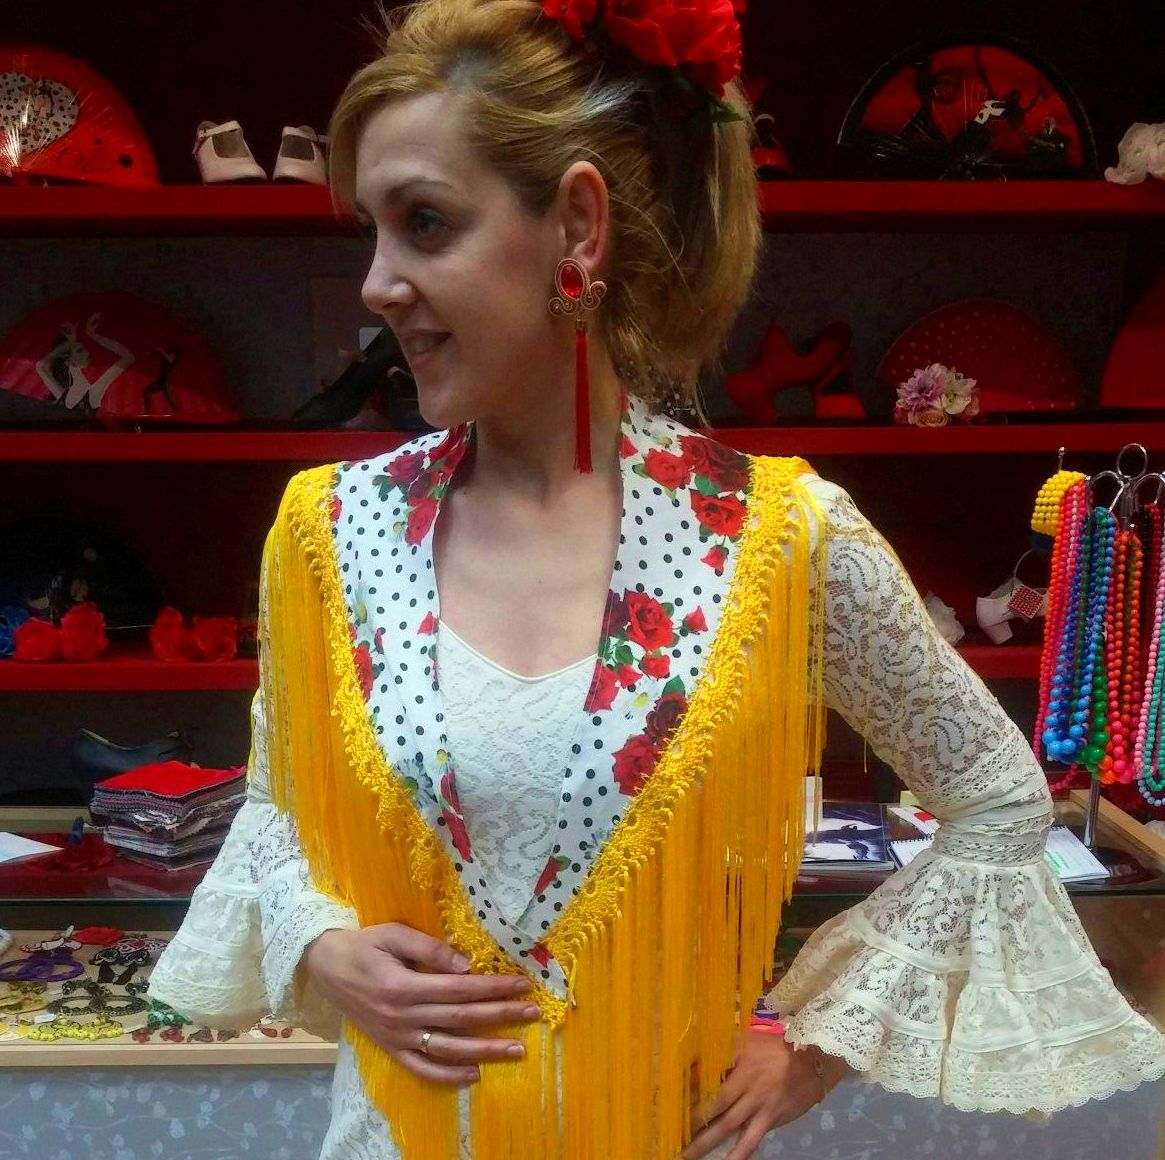 Mantones, tienda moda flamenca, Zaragoza.